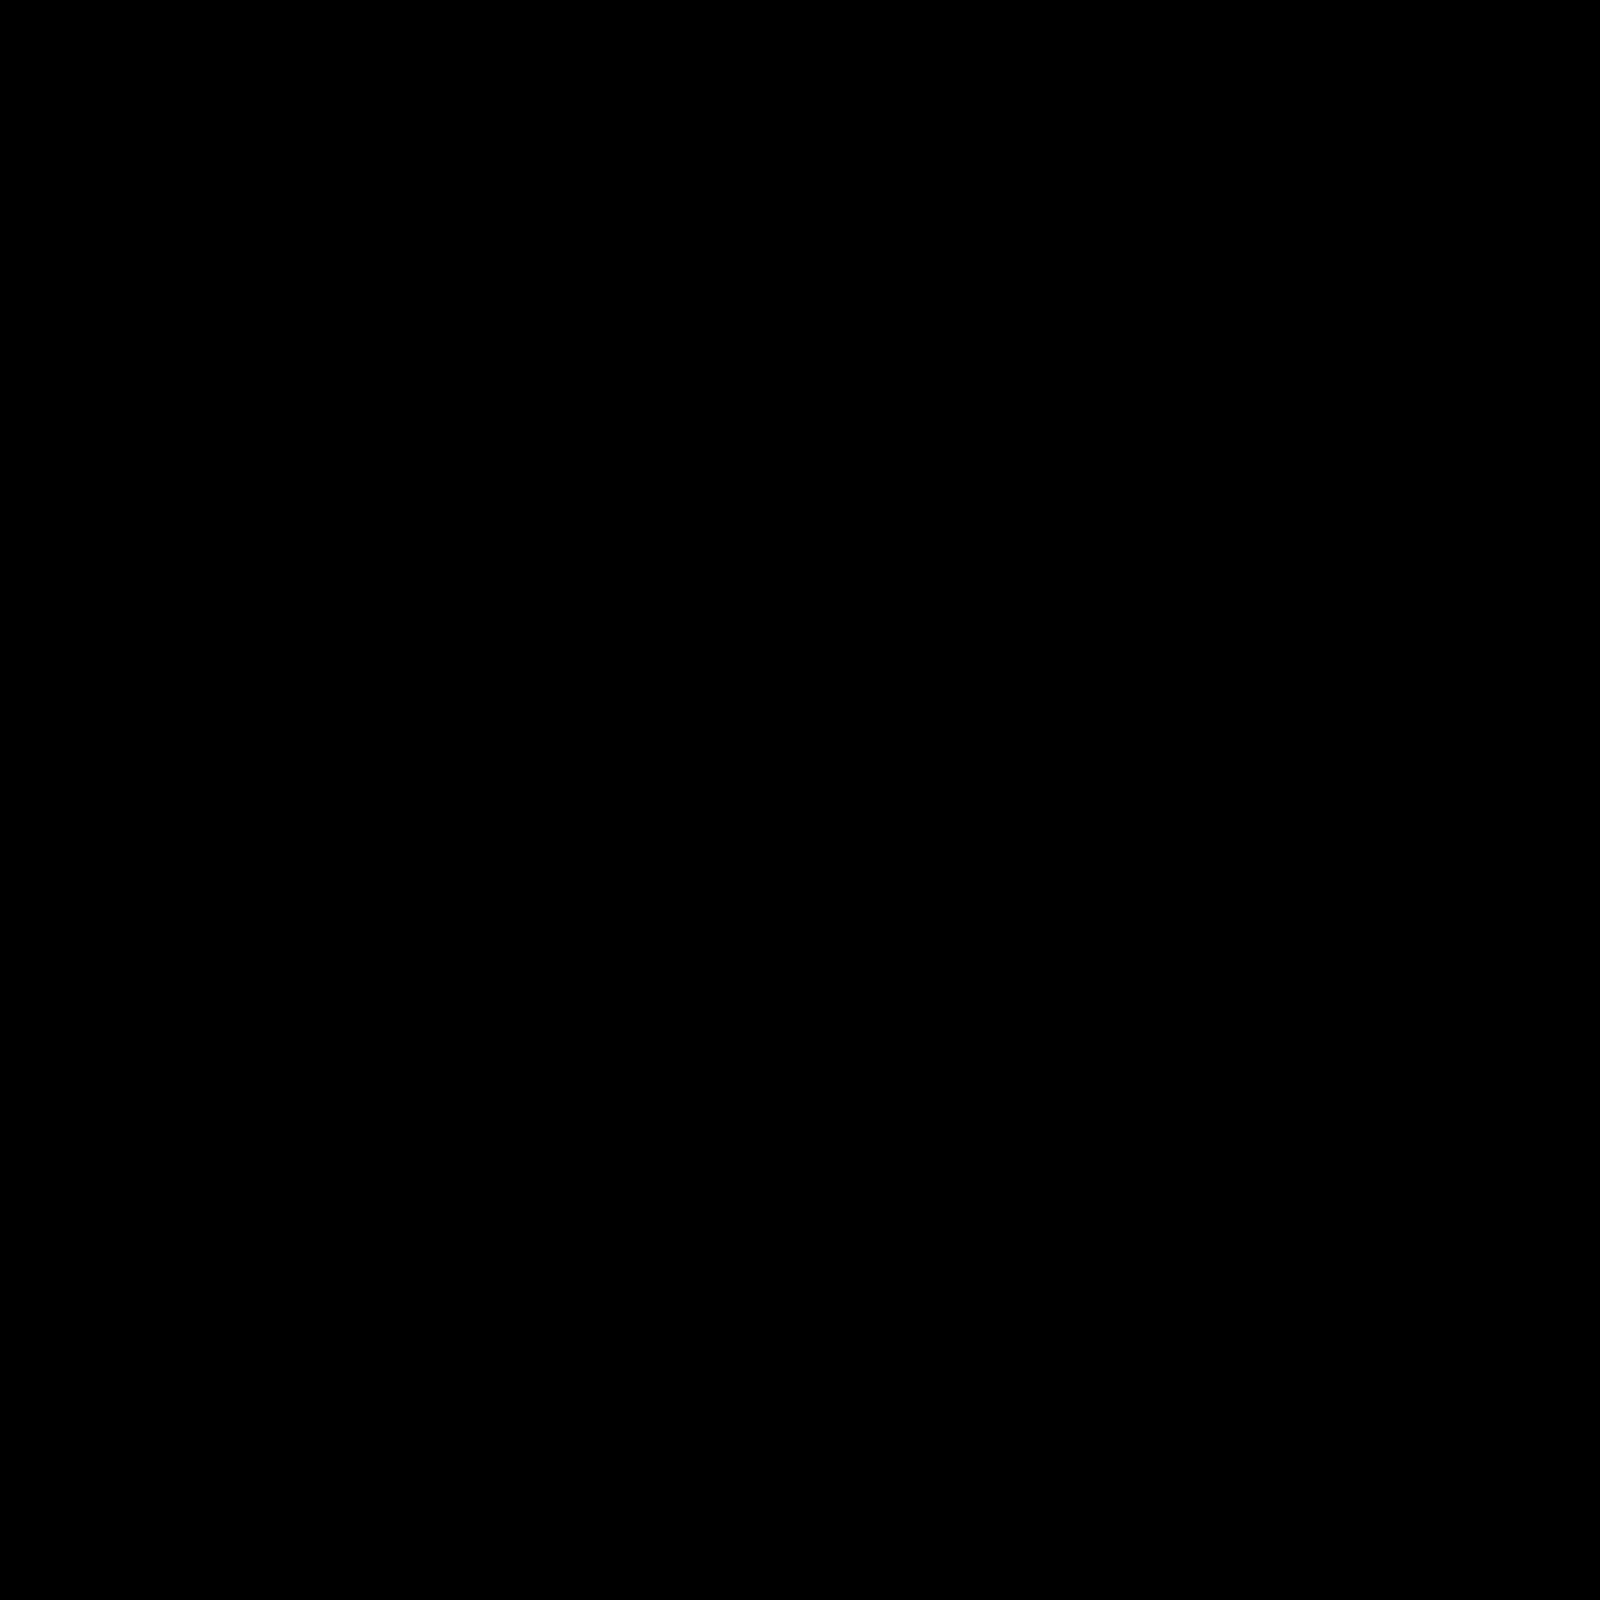 Vest Filled icon